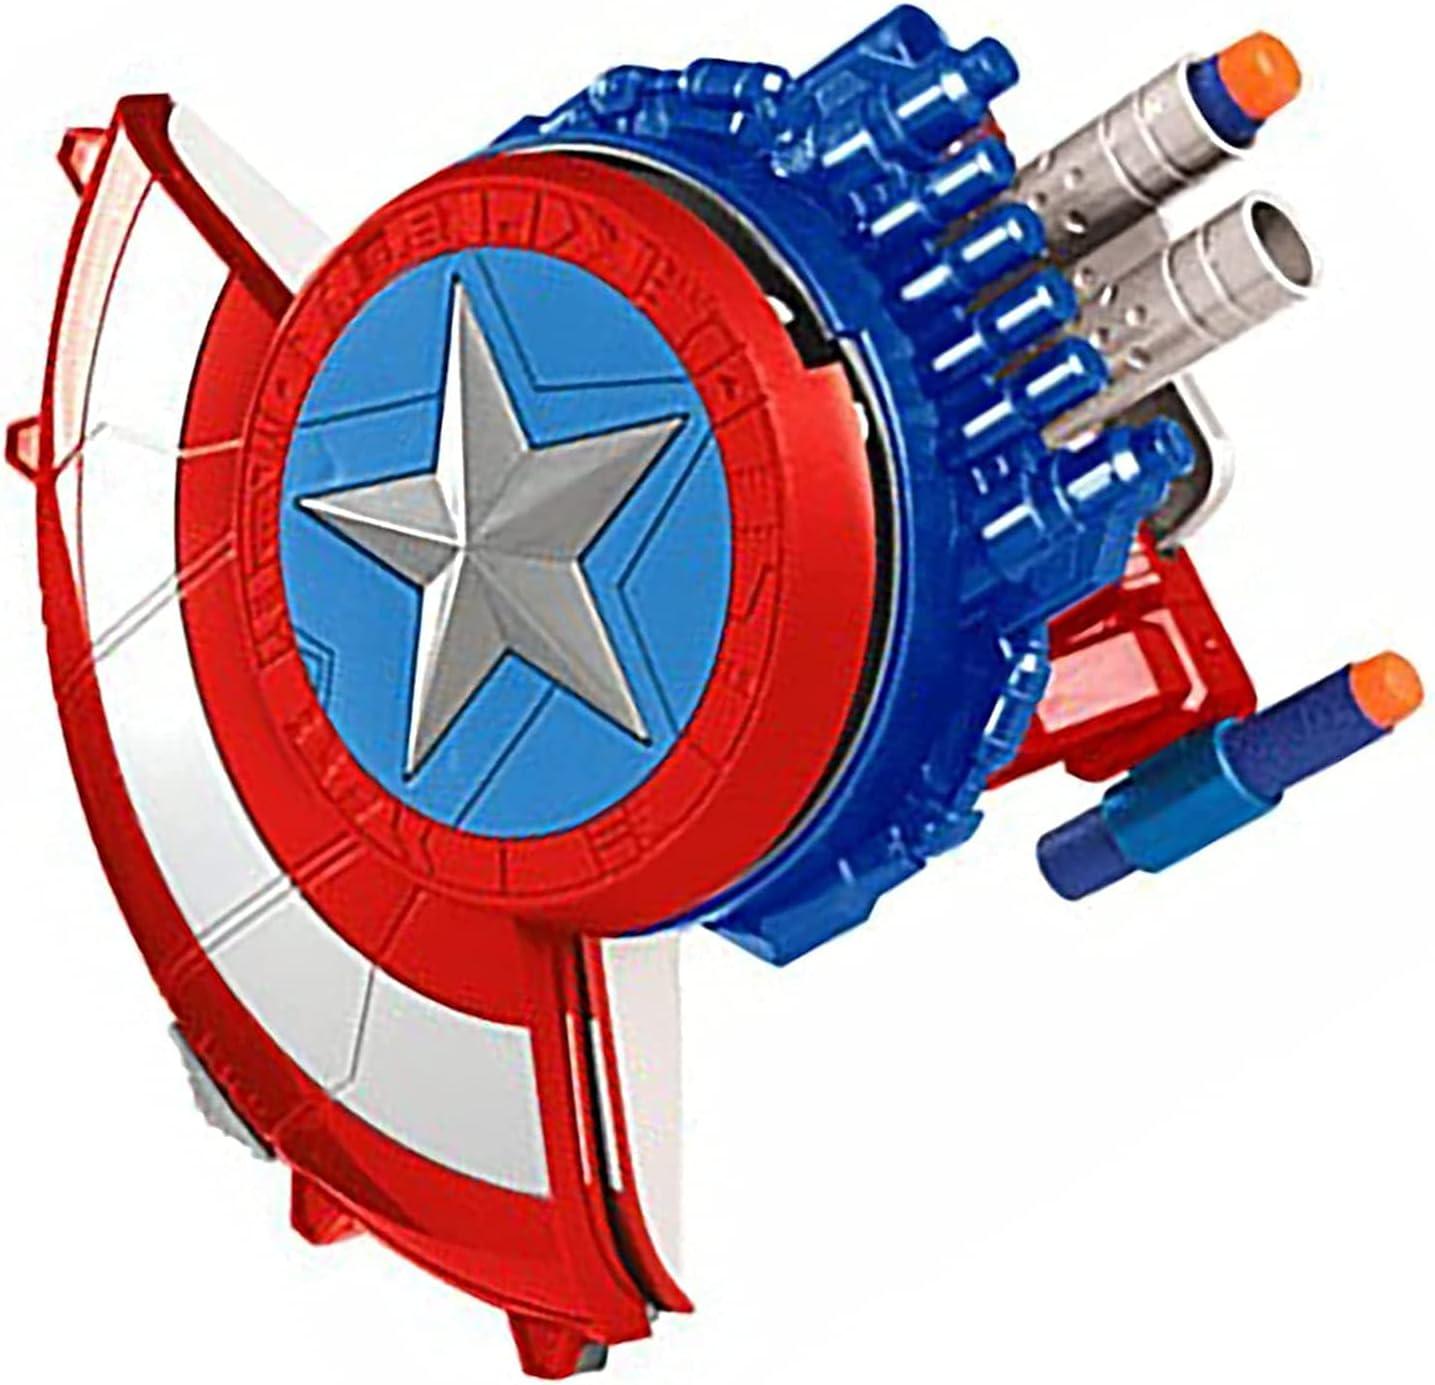 BDBT Marvel Avengers Series Capitán América Shield - Pistola Bomba de Juguete para niños - con 10 Bombas de Lanzamiento Suaves adecuadas para Cosplay Lanzador de Bombas, Regalos para niños